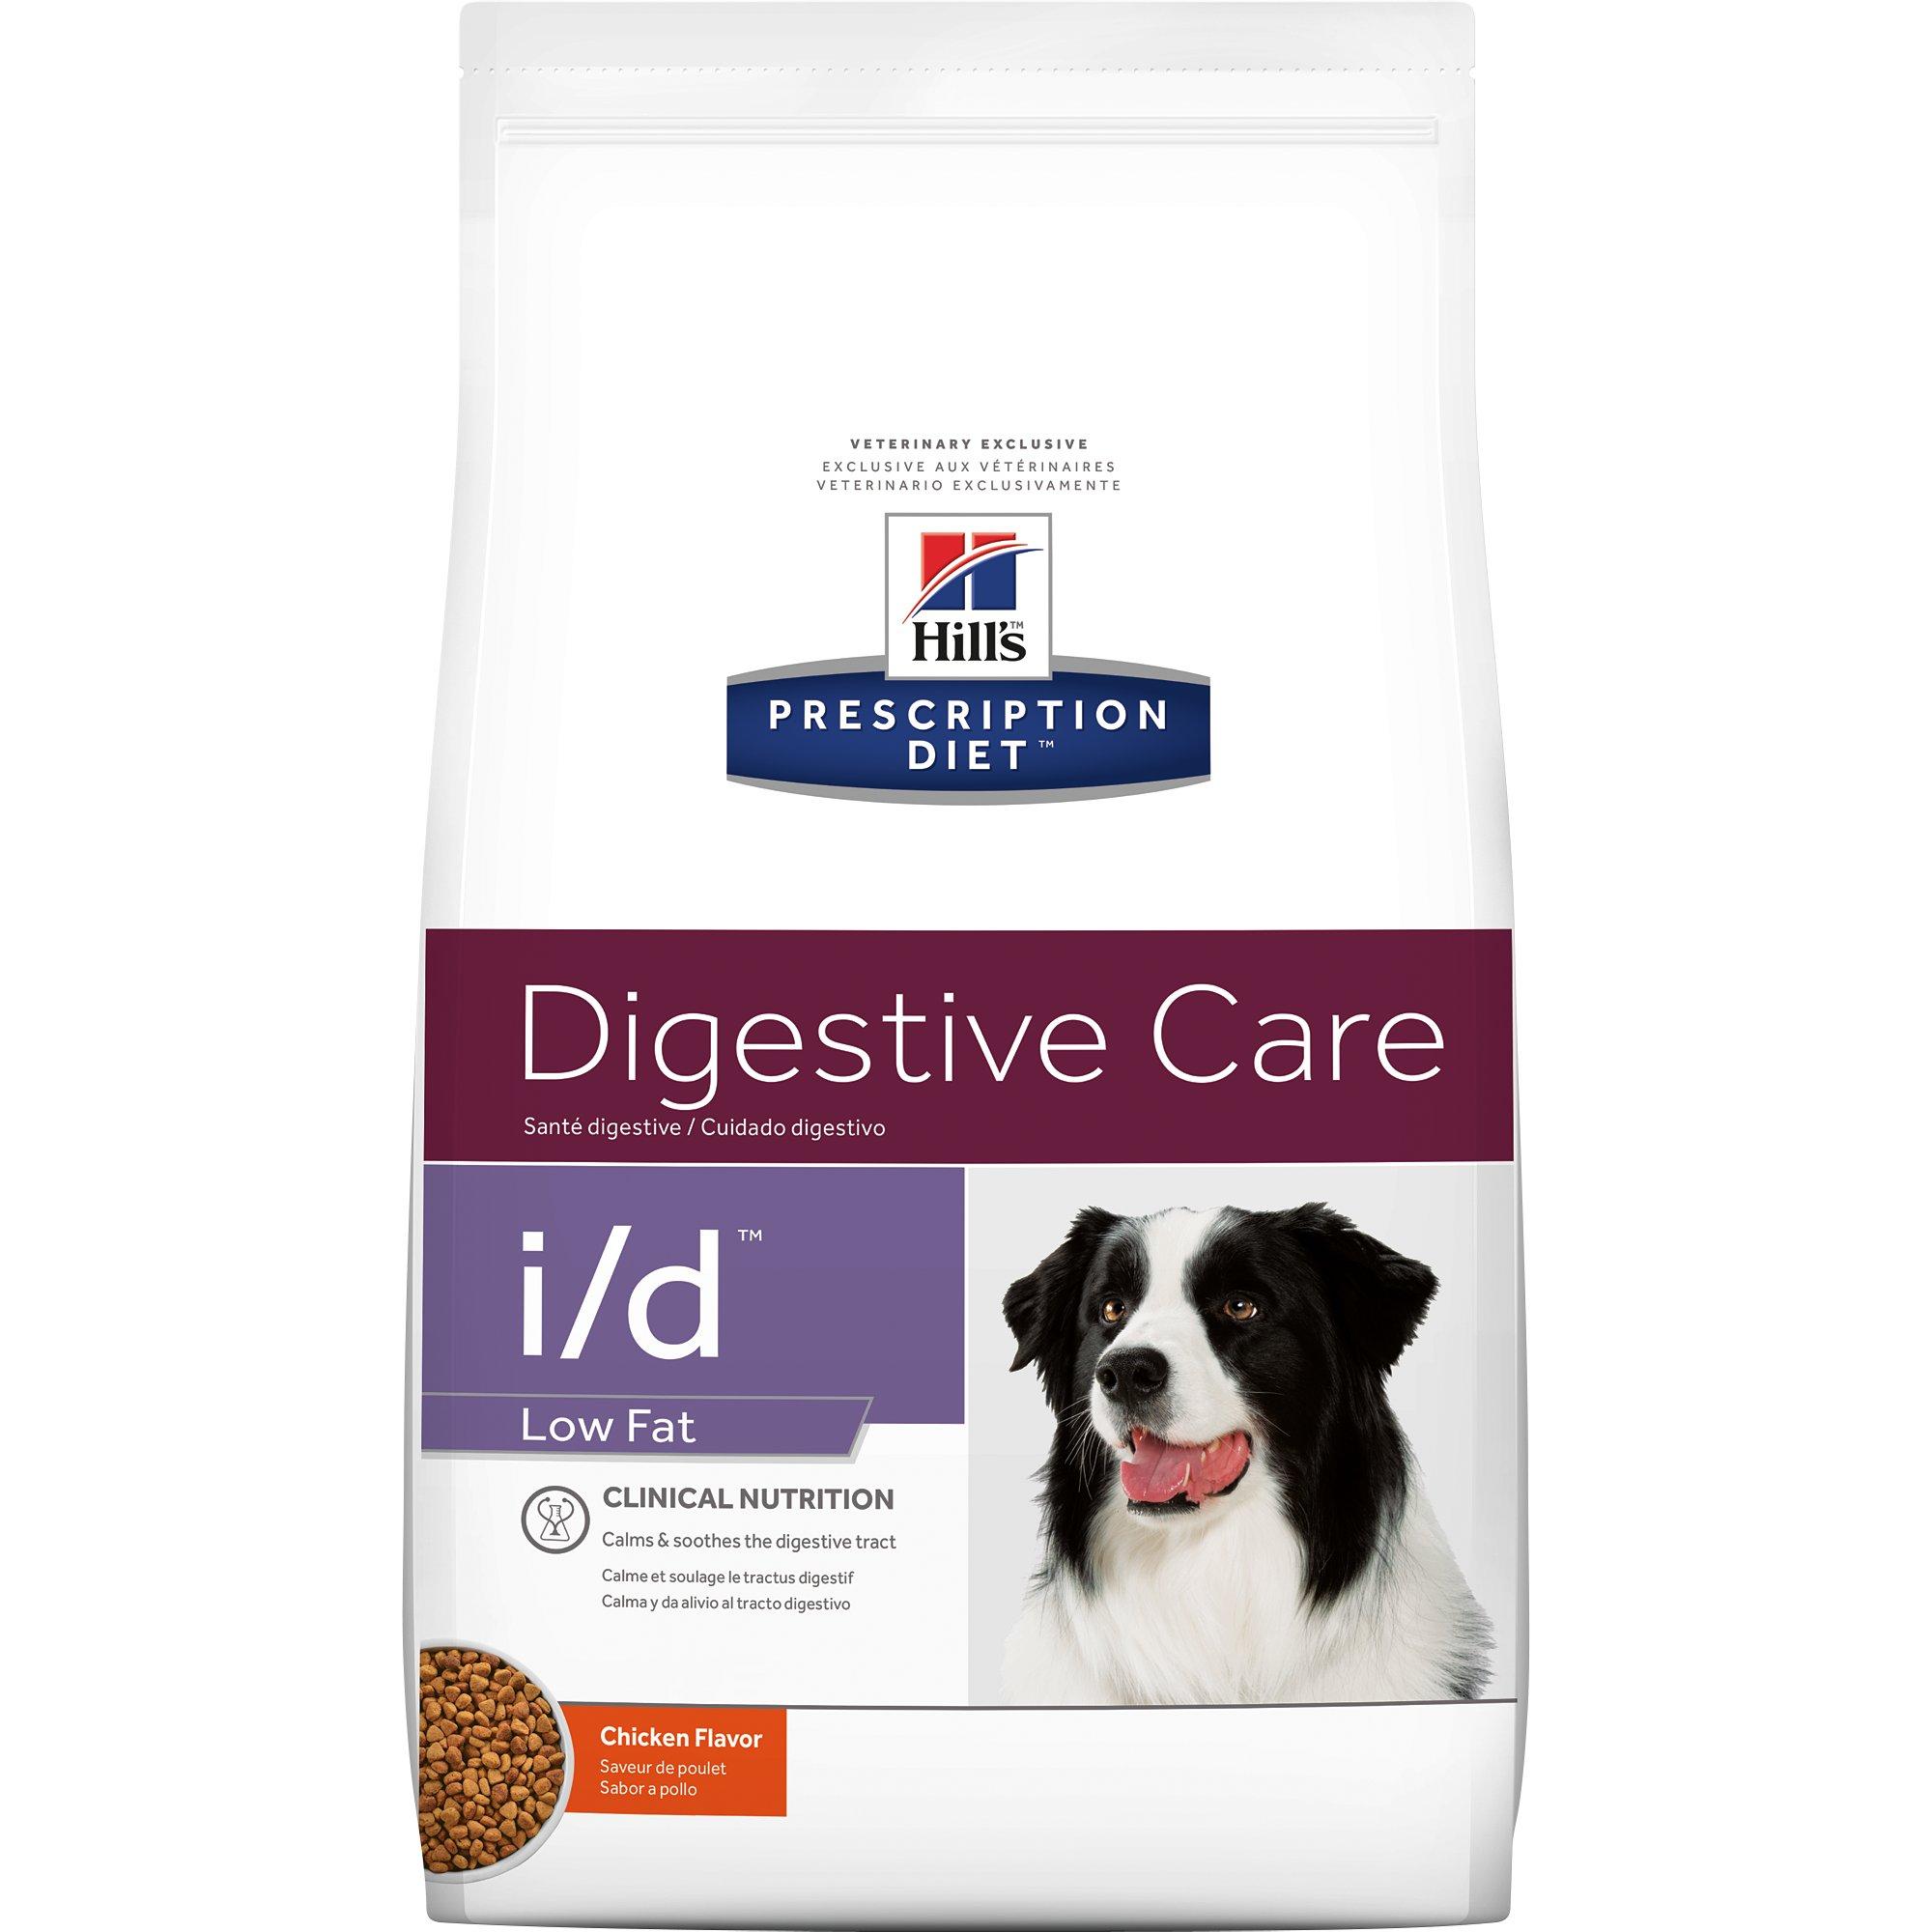 digestive care dog food